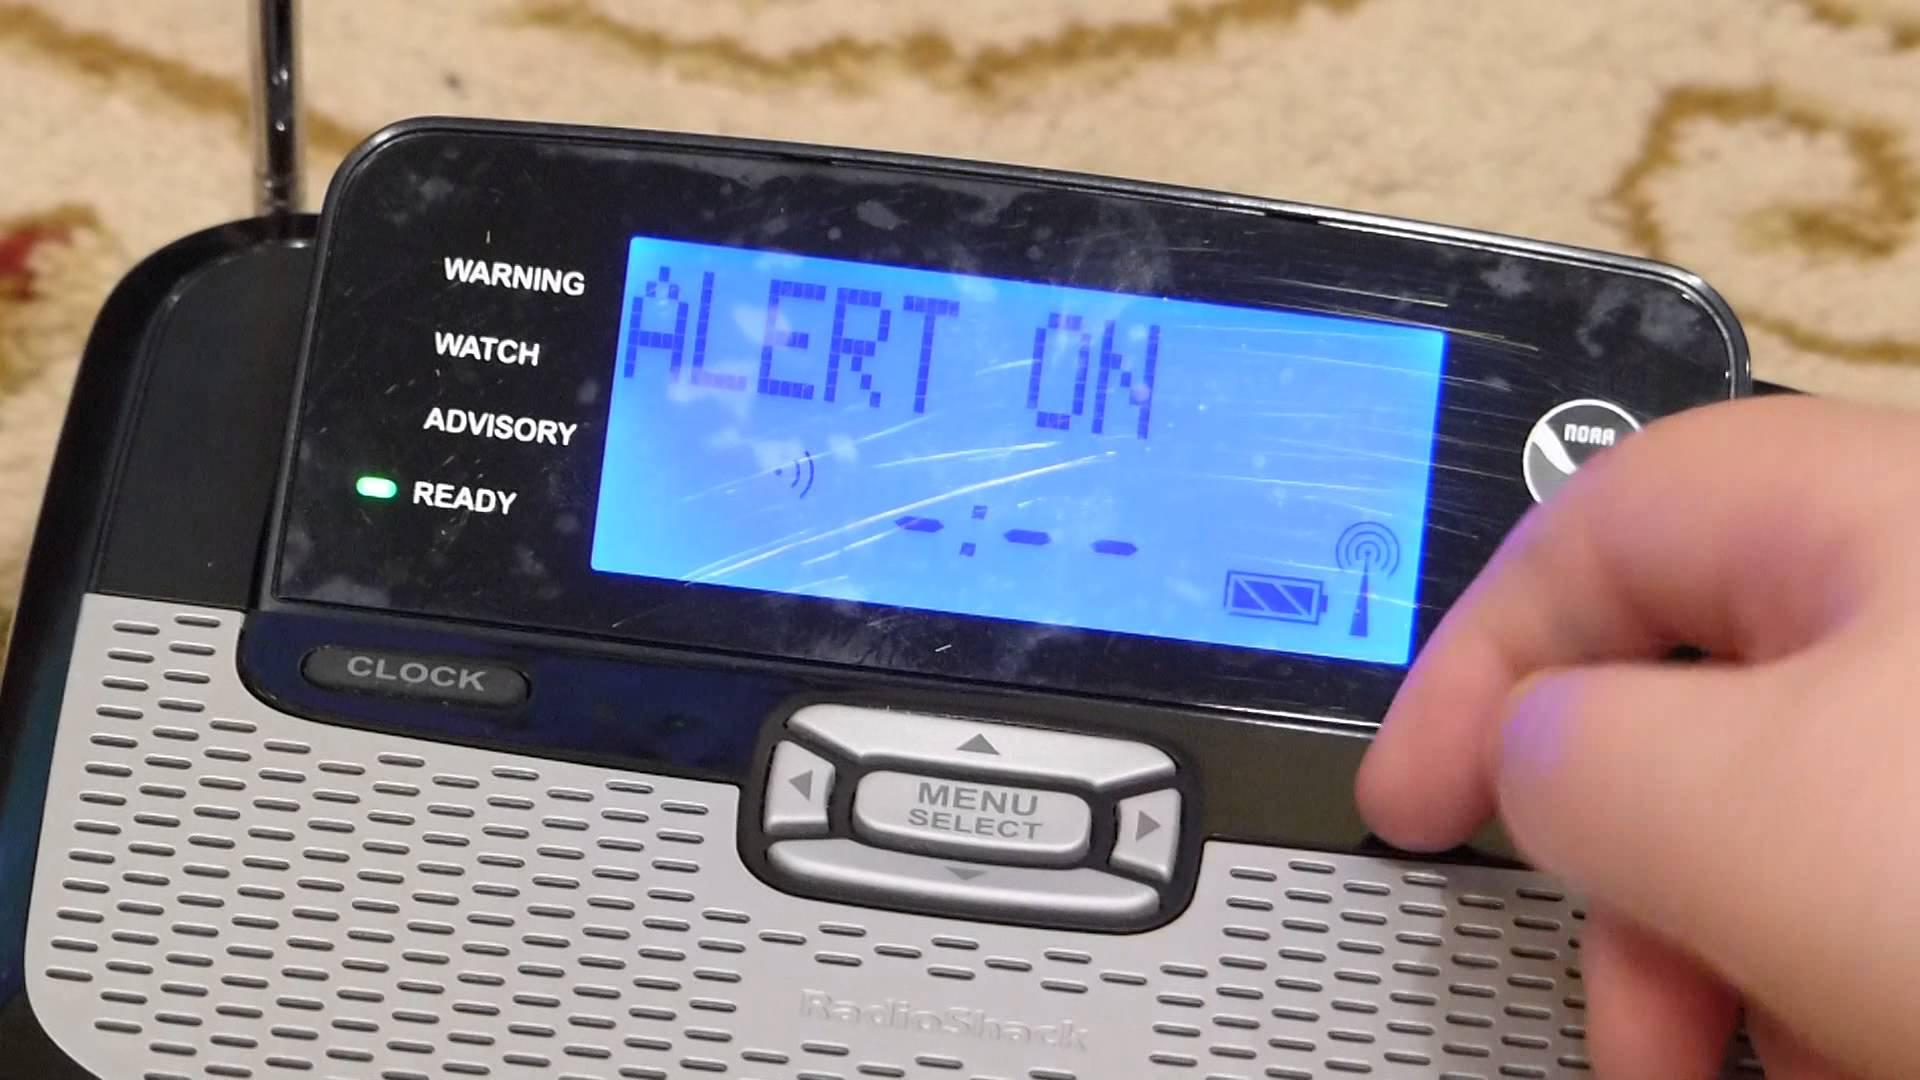 the ultimate weather alert radio buying guide weather alert radio rh weatheralertradio review Radio Shack Weather Forecaster Radio Shack NOAA Weather Radio